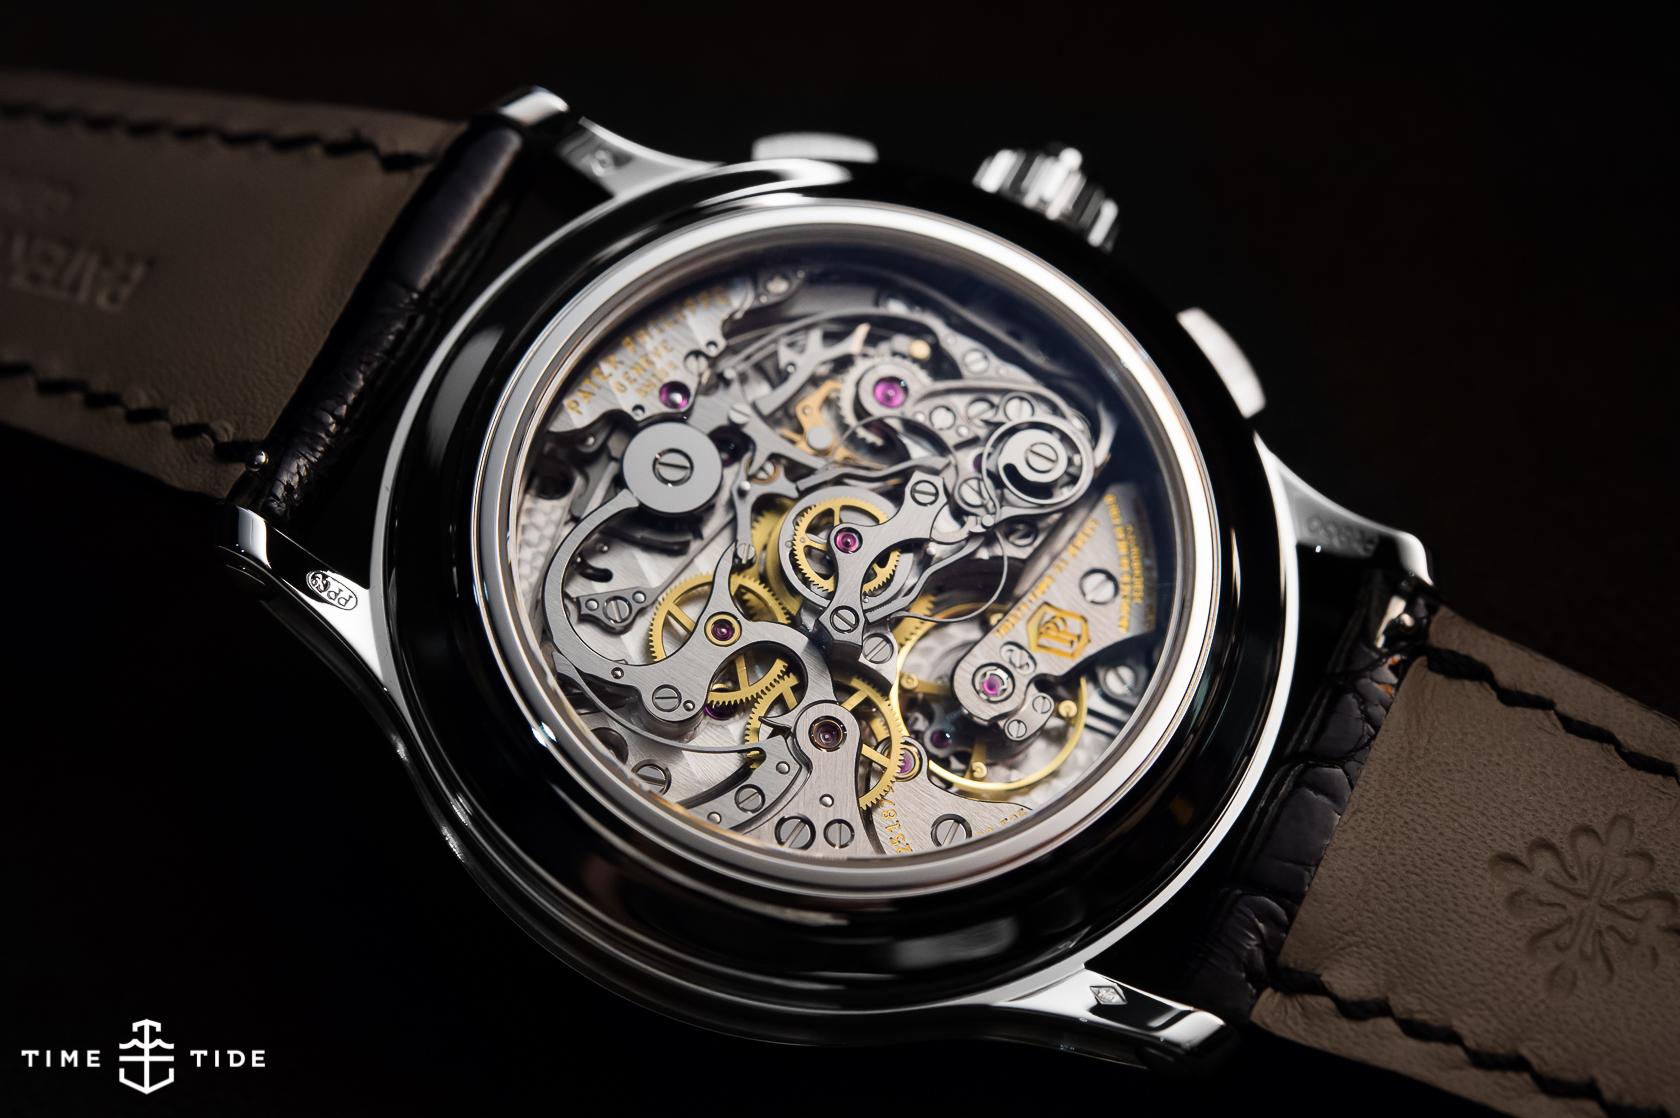 Patek Philippe split-seconds chronograph Ref.5370P-5